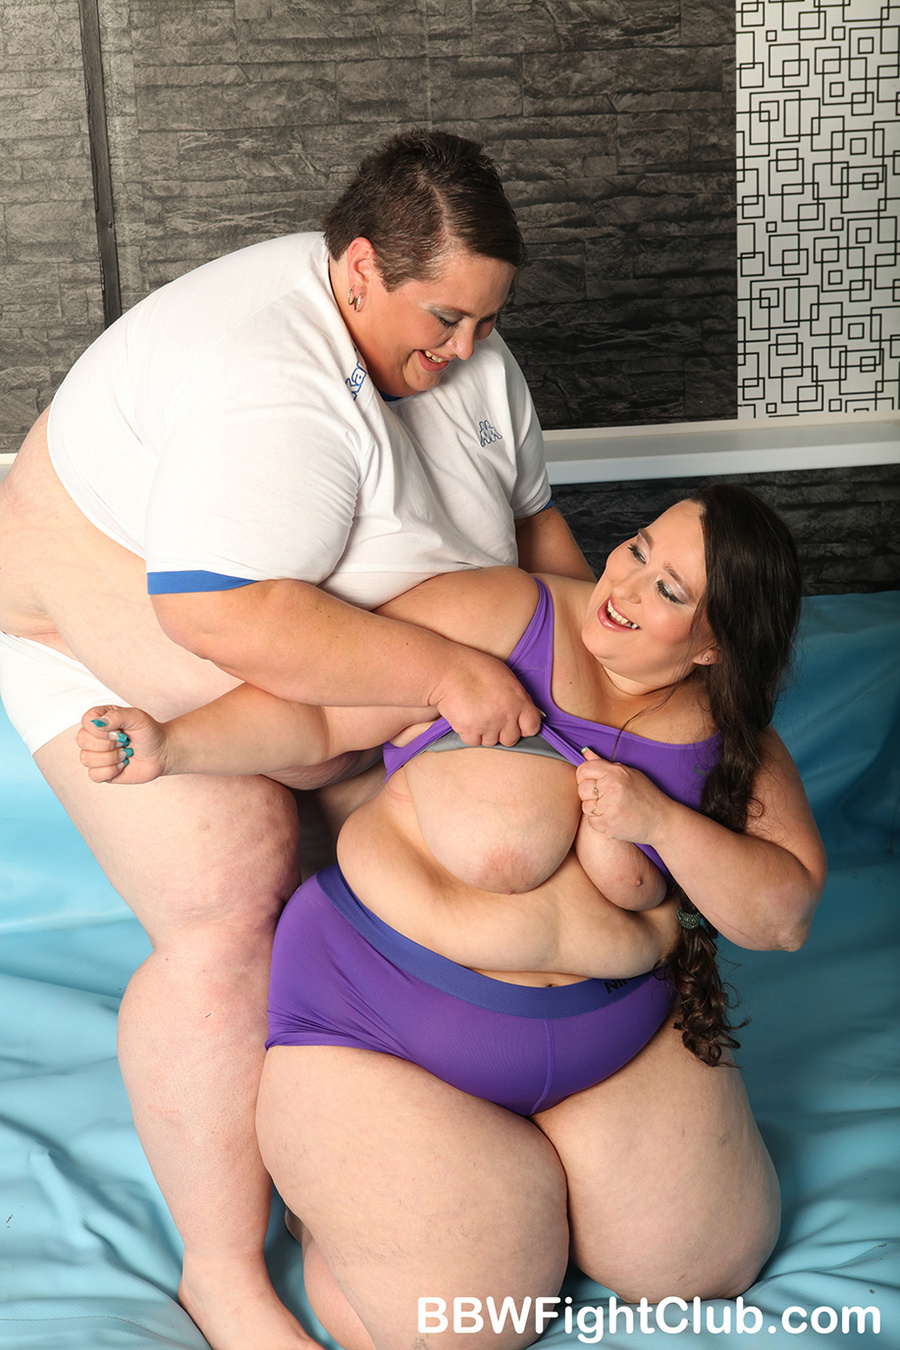 Extremely fat women xxx naked image